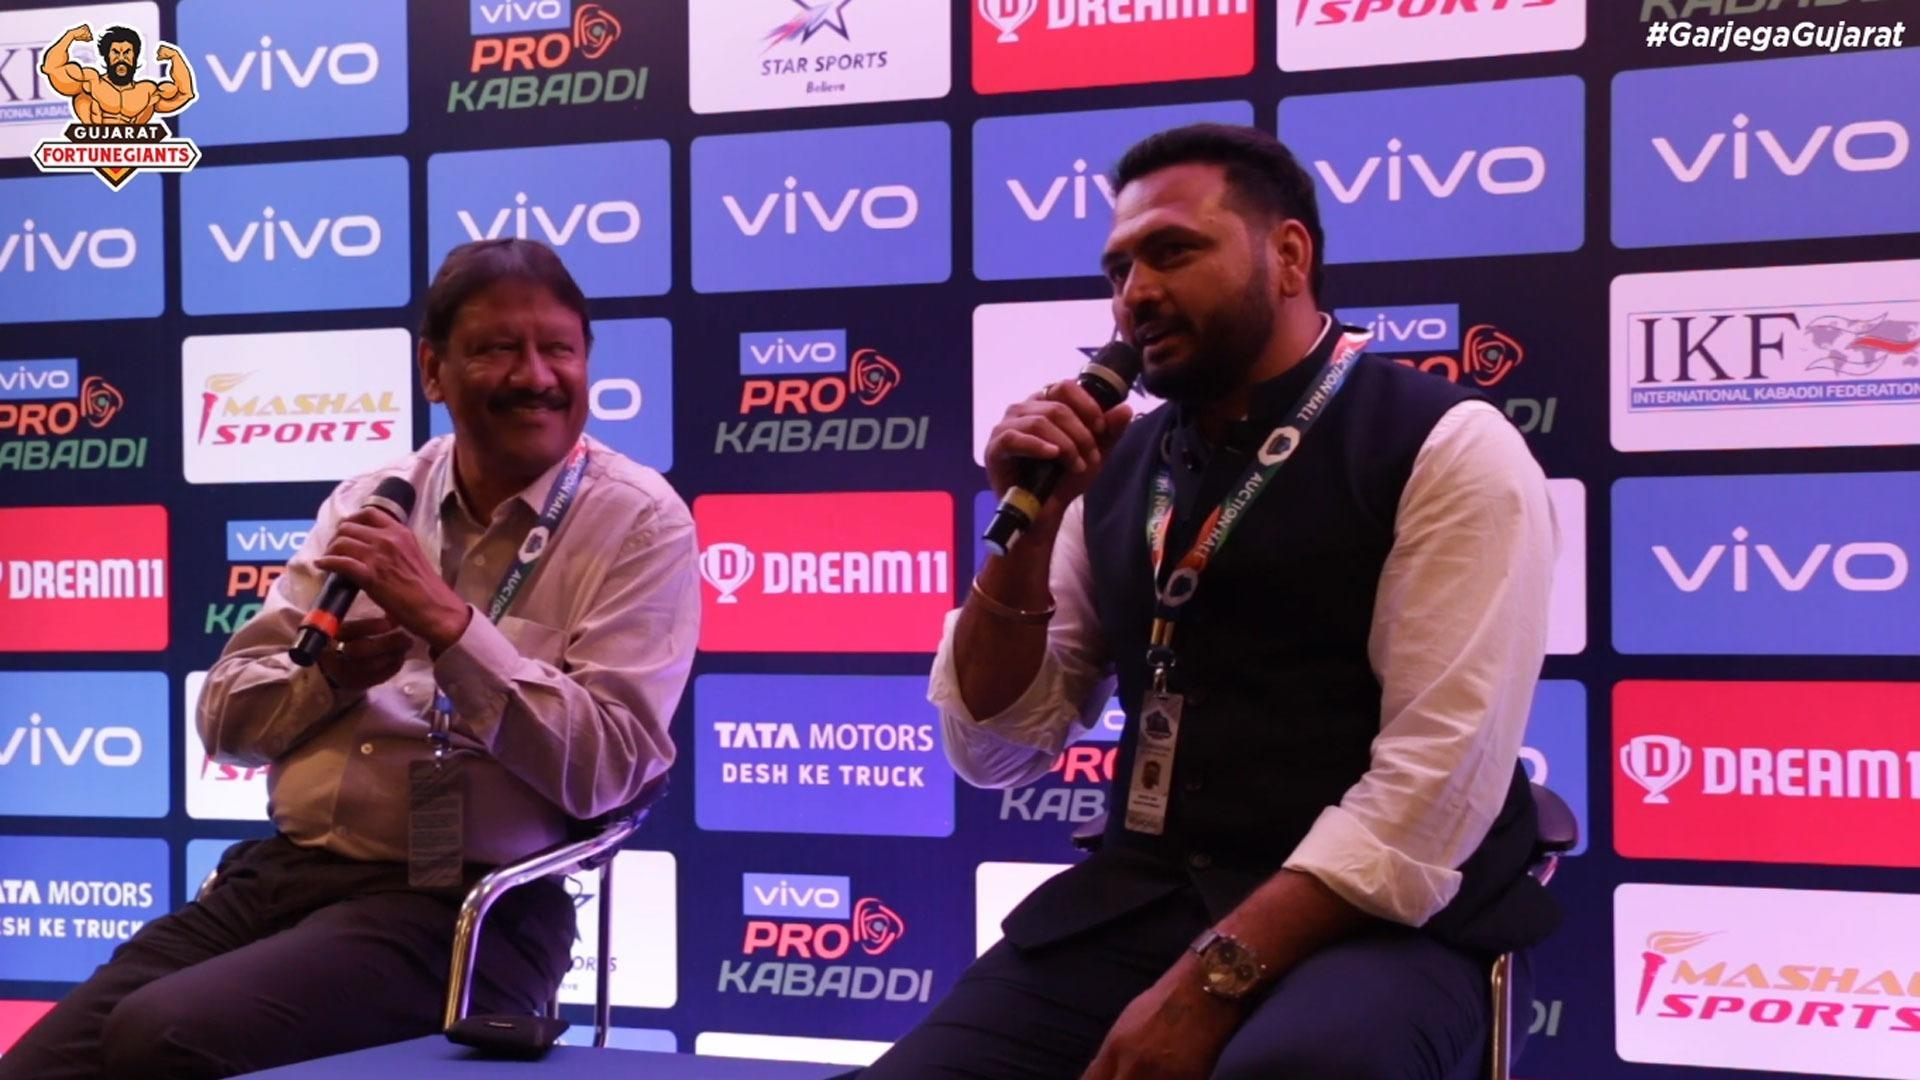 Manpreet Singh At VIVO Pro Kabaddi Season 7 Auction